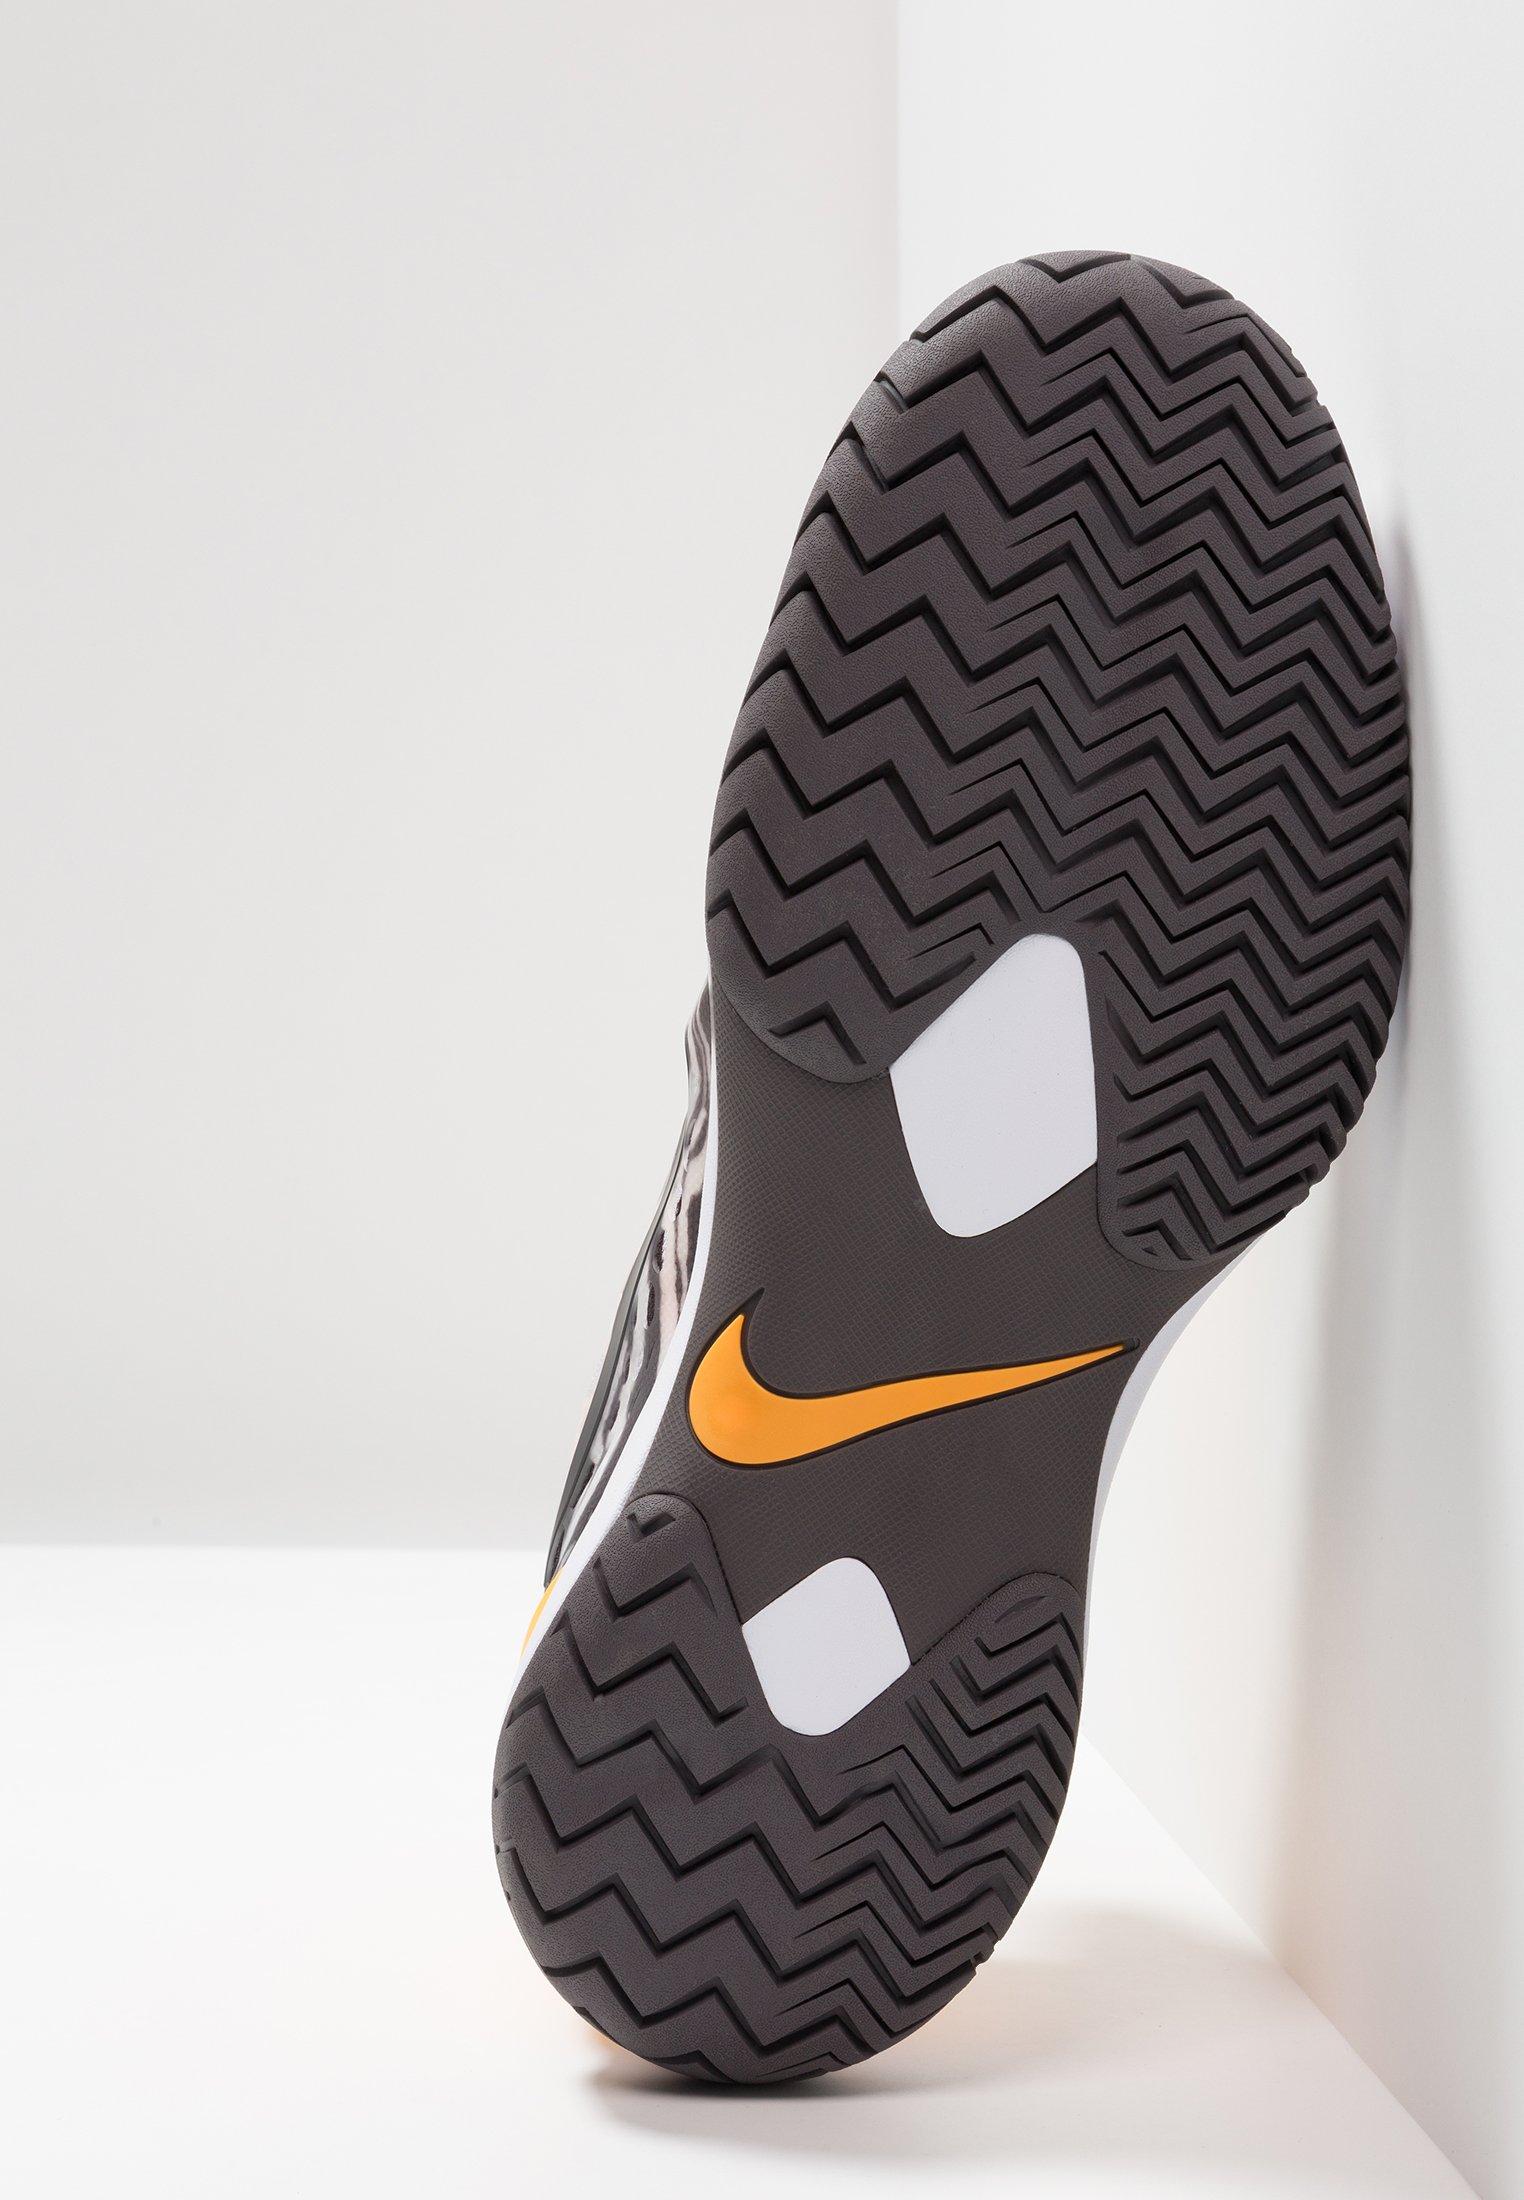 Air Pure Tennis Terre De Orange HcChaussures laser Platinum Cage Pour Nike Battue thunder Grey battueerre white 3 Performance Zoom cRjLA4q35